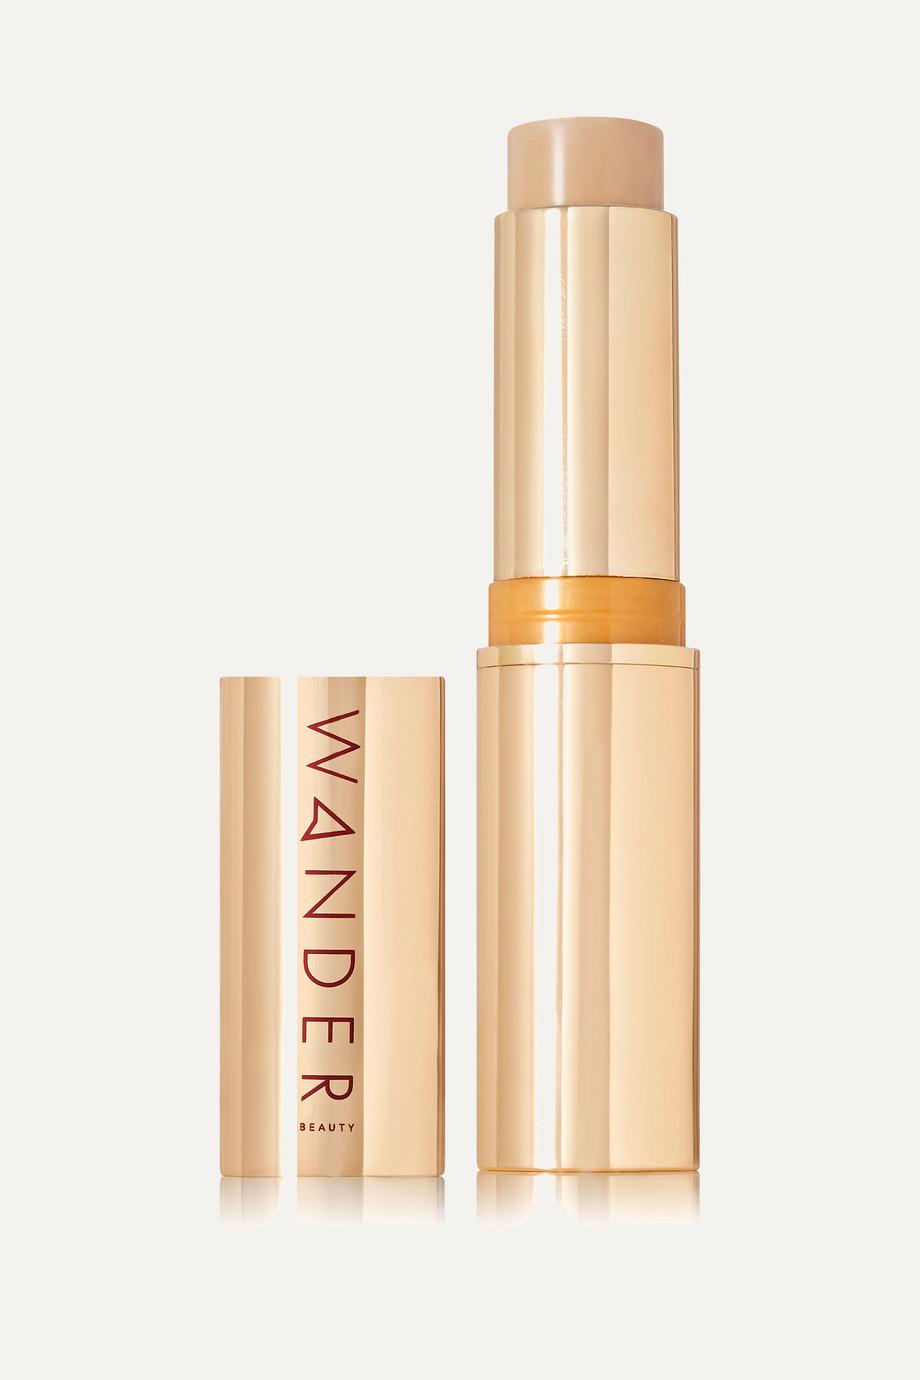 Wander Beauty Flash Focus Hydrating Foundation Stick - Fair